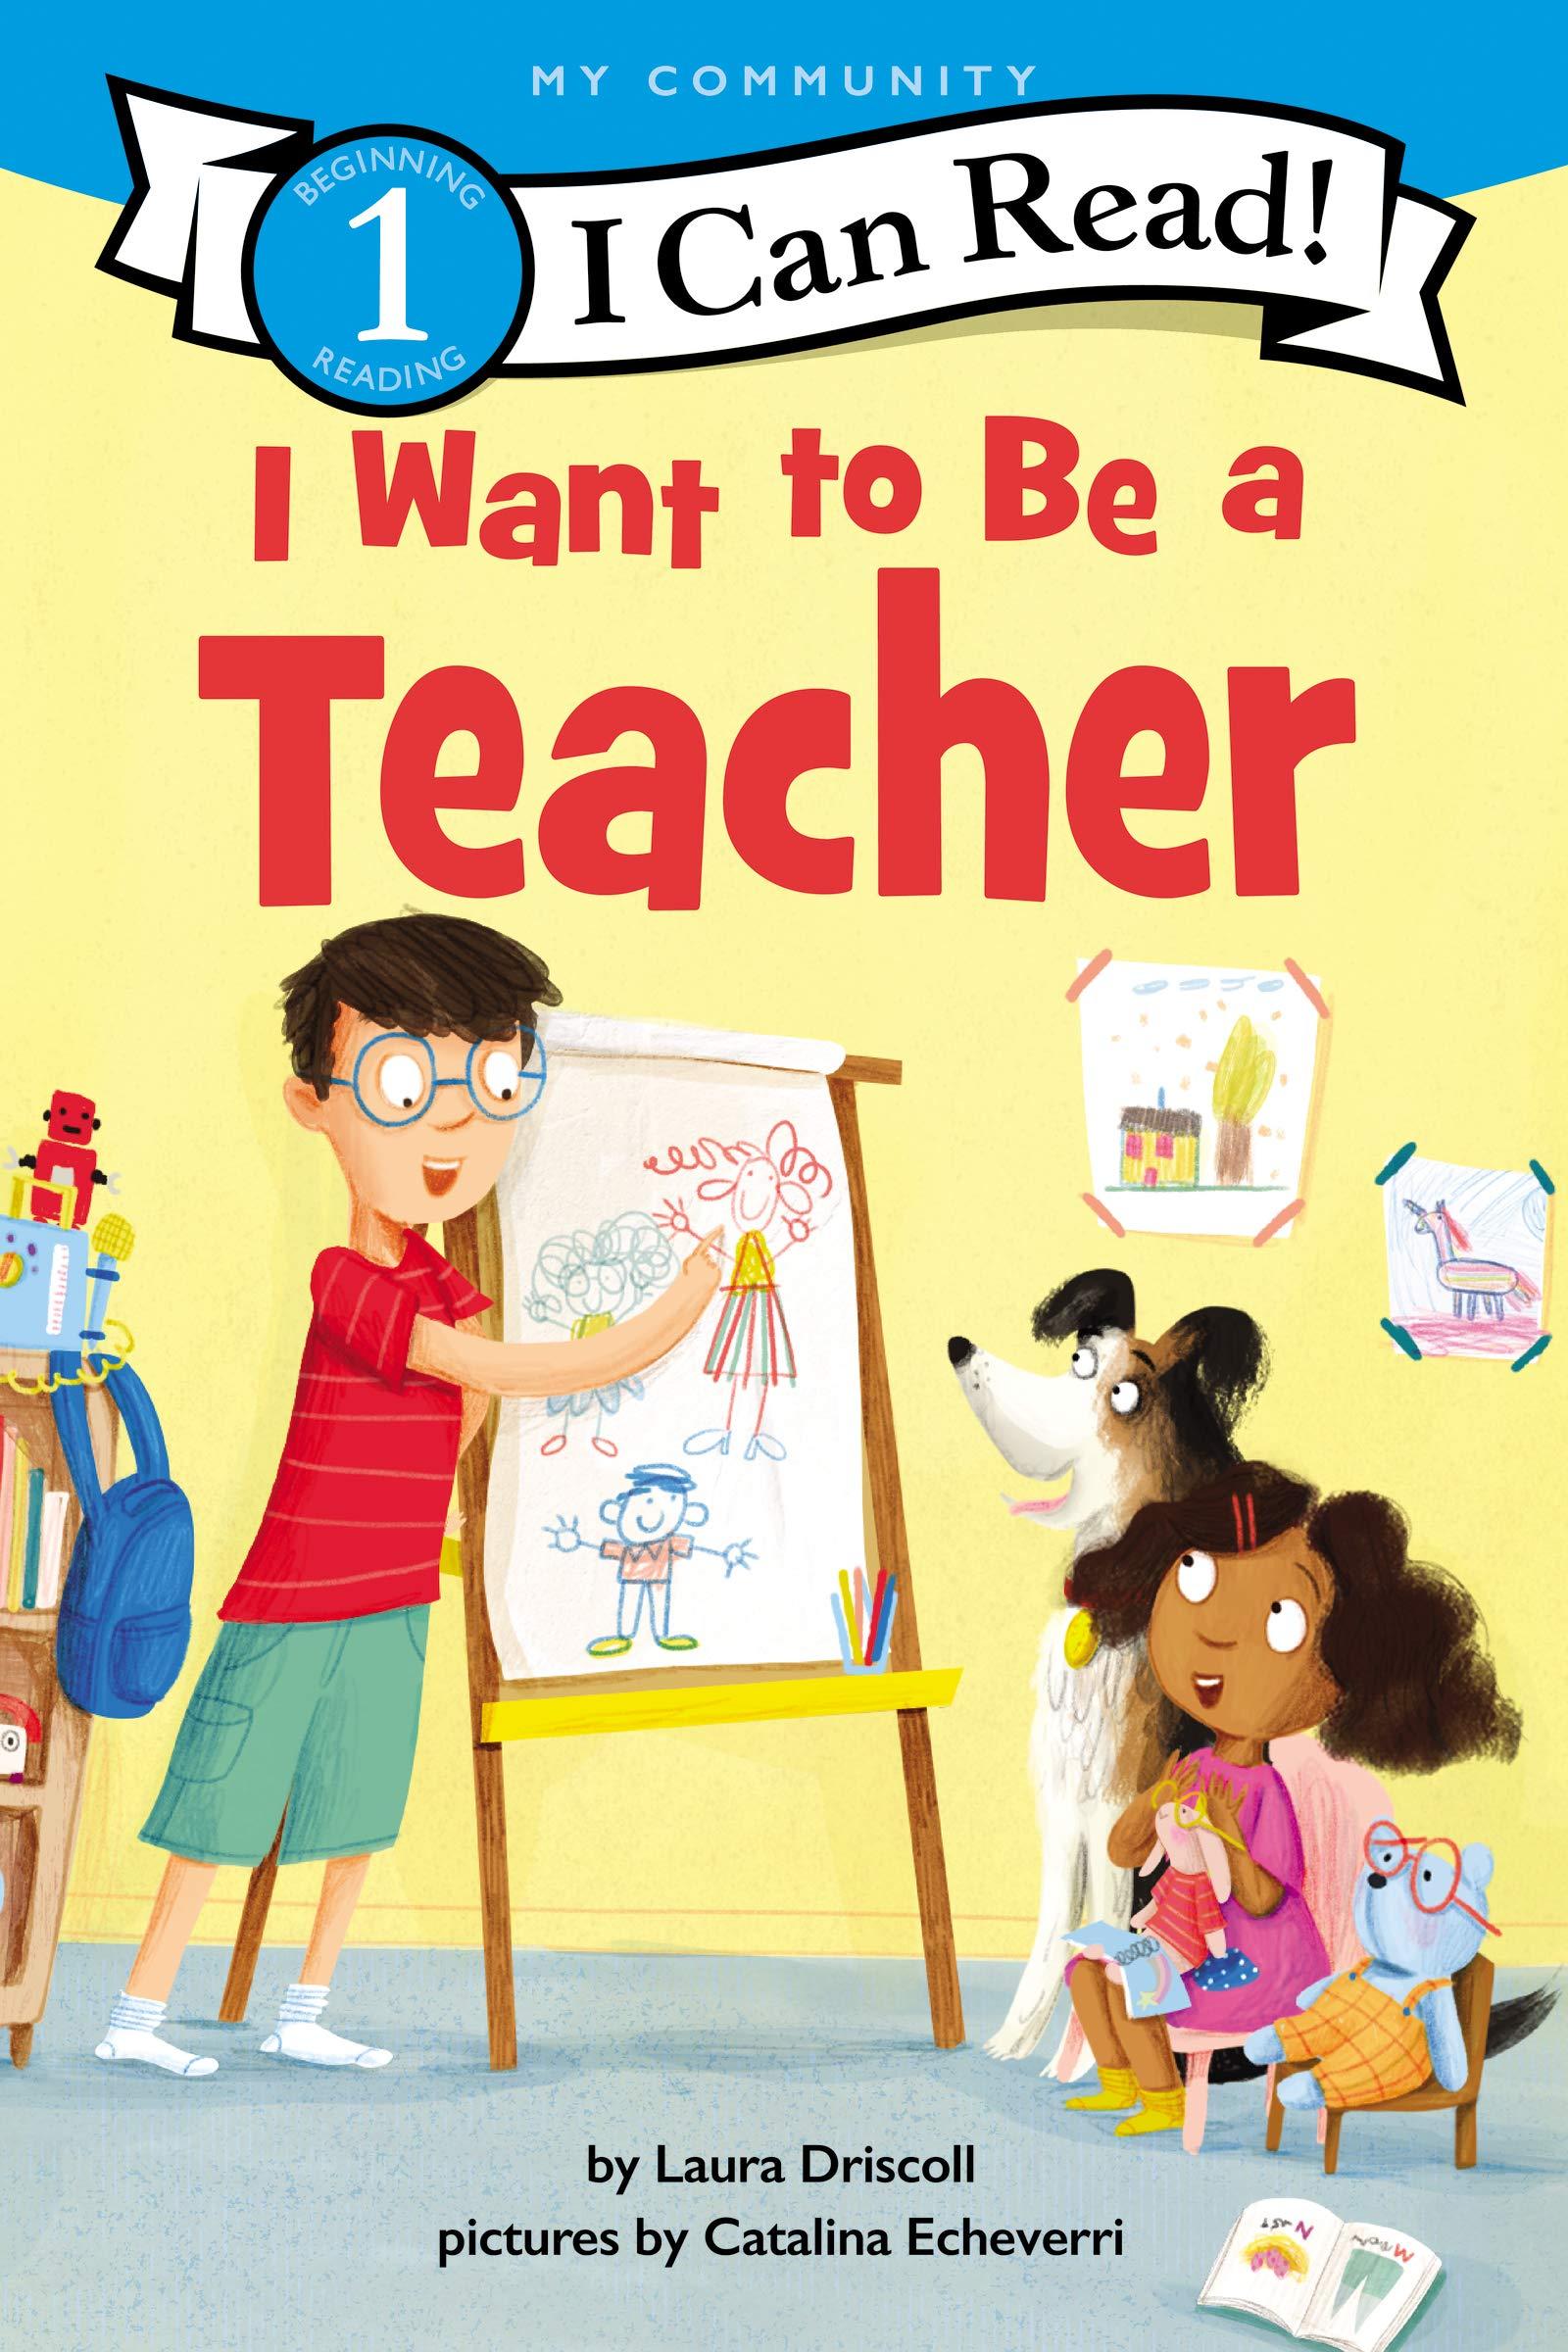 I Want to Be a Teacher (I Can Read Level 1): Driscoll, Laura, Echeverri,  Catalina: 9780062989543: Amazon.com: Books